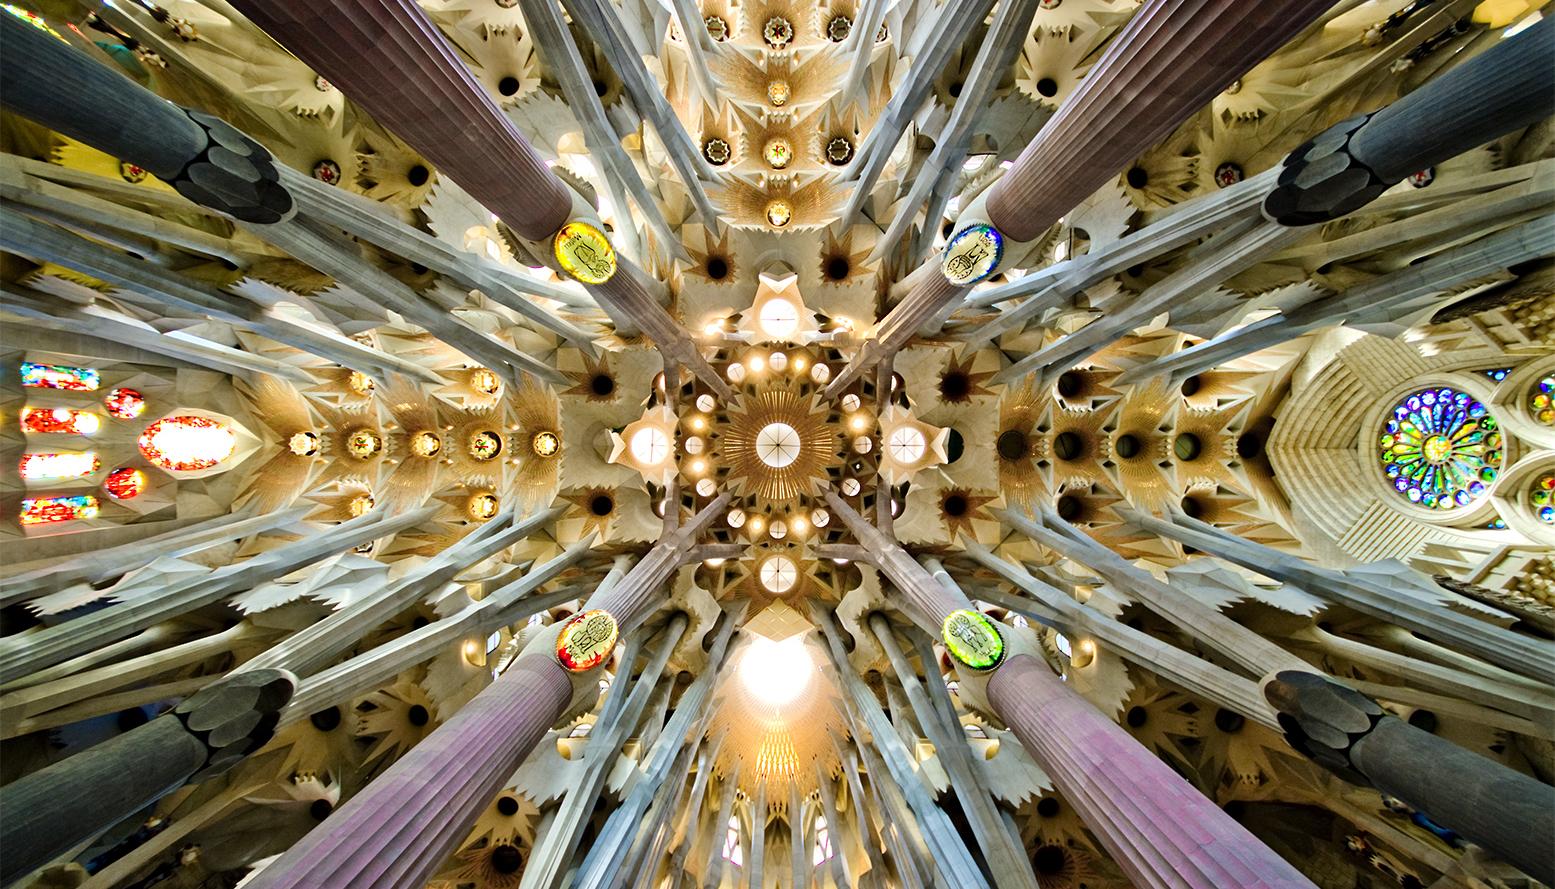 The central nave at Sagrada Familia